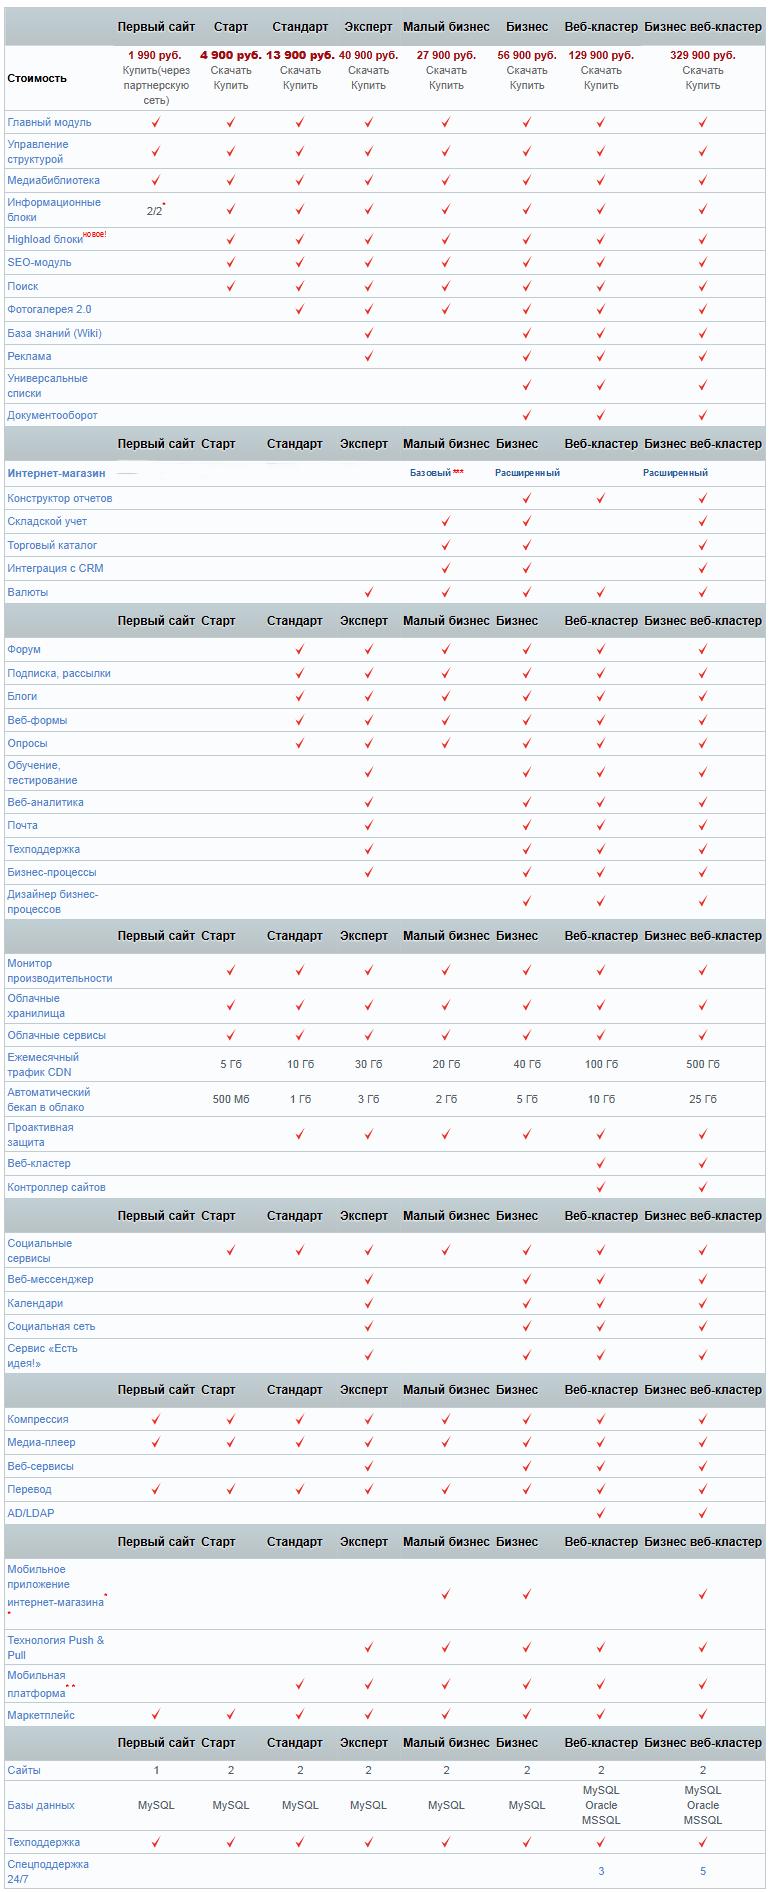 Сравнение версий битрикса bootstrap подключить в битрикс